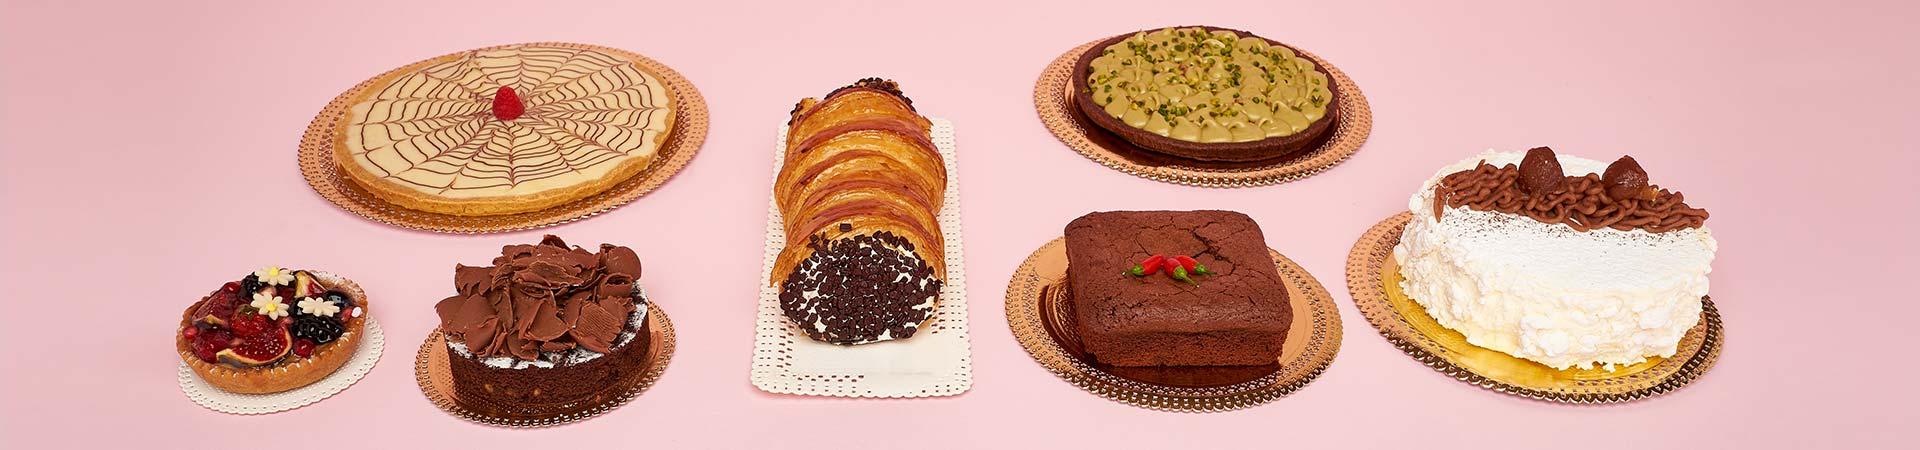 Novacart Cardboard Doilies for cakes